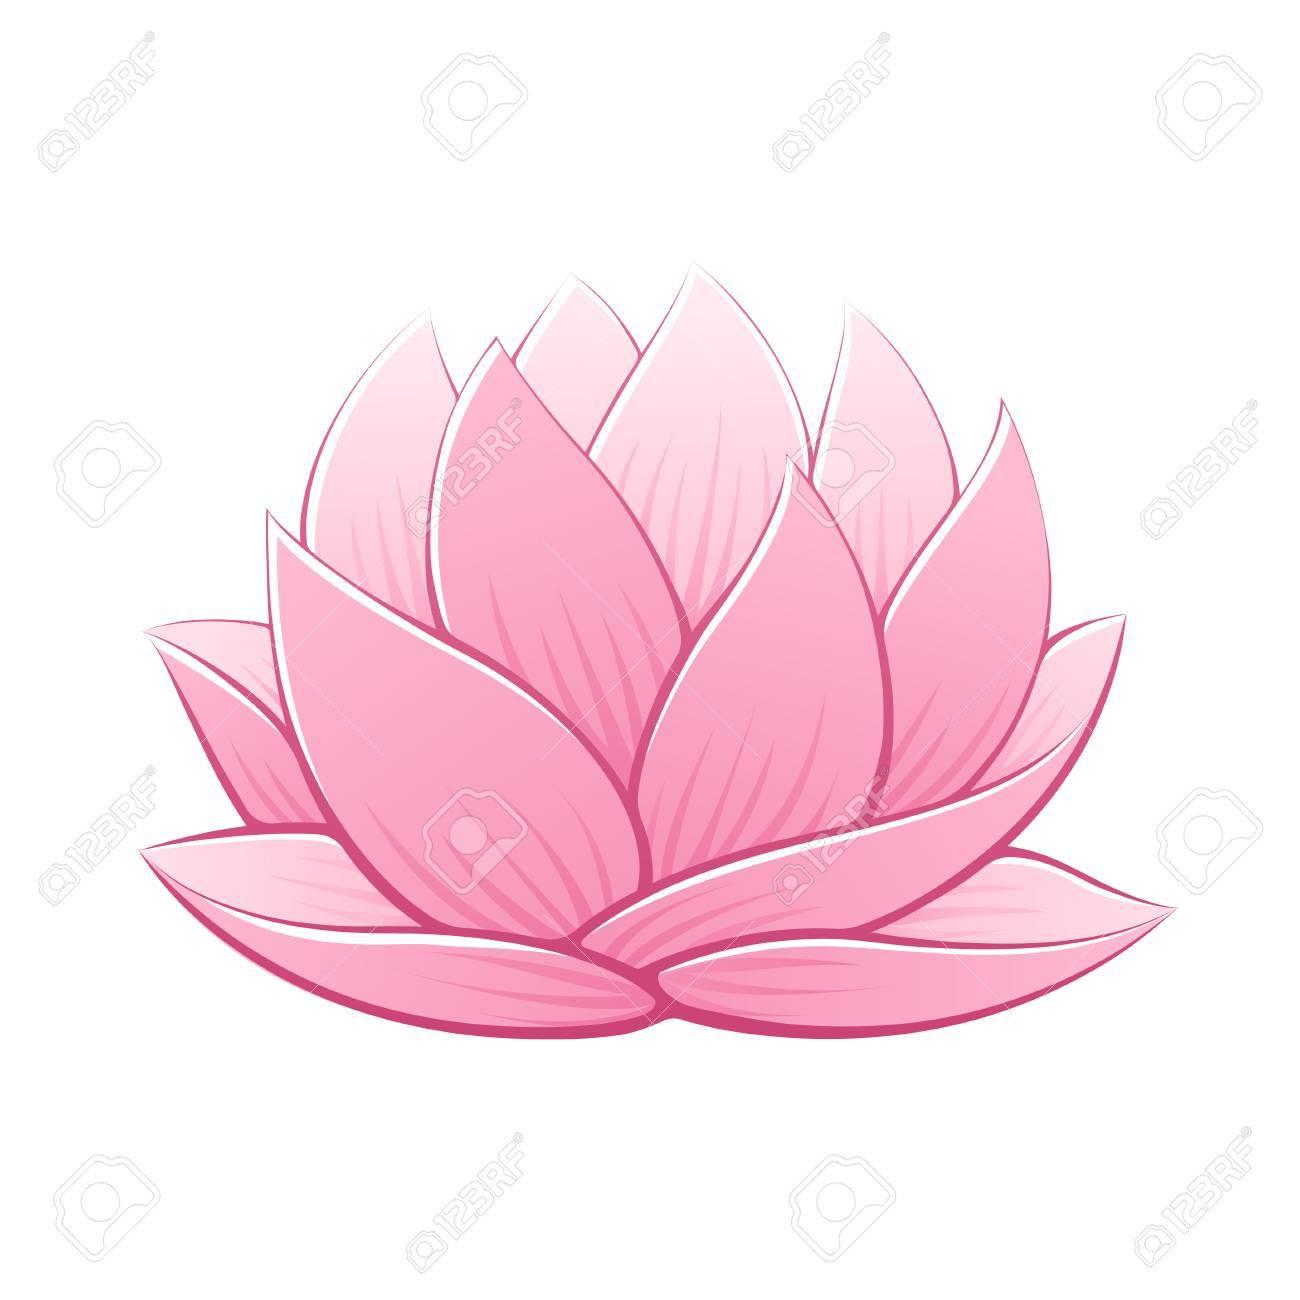 1300x1300 Pink Lotus Flower Vector Illustration. Beautiful Realistic